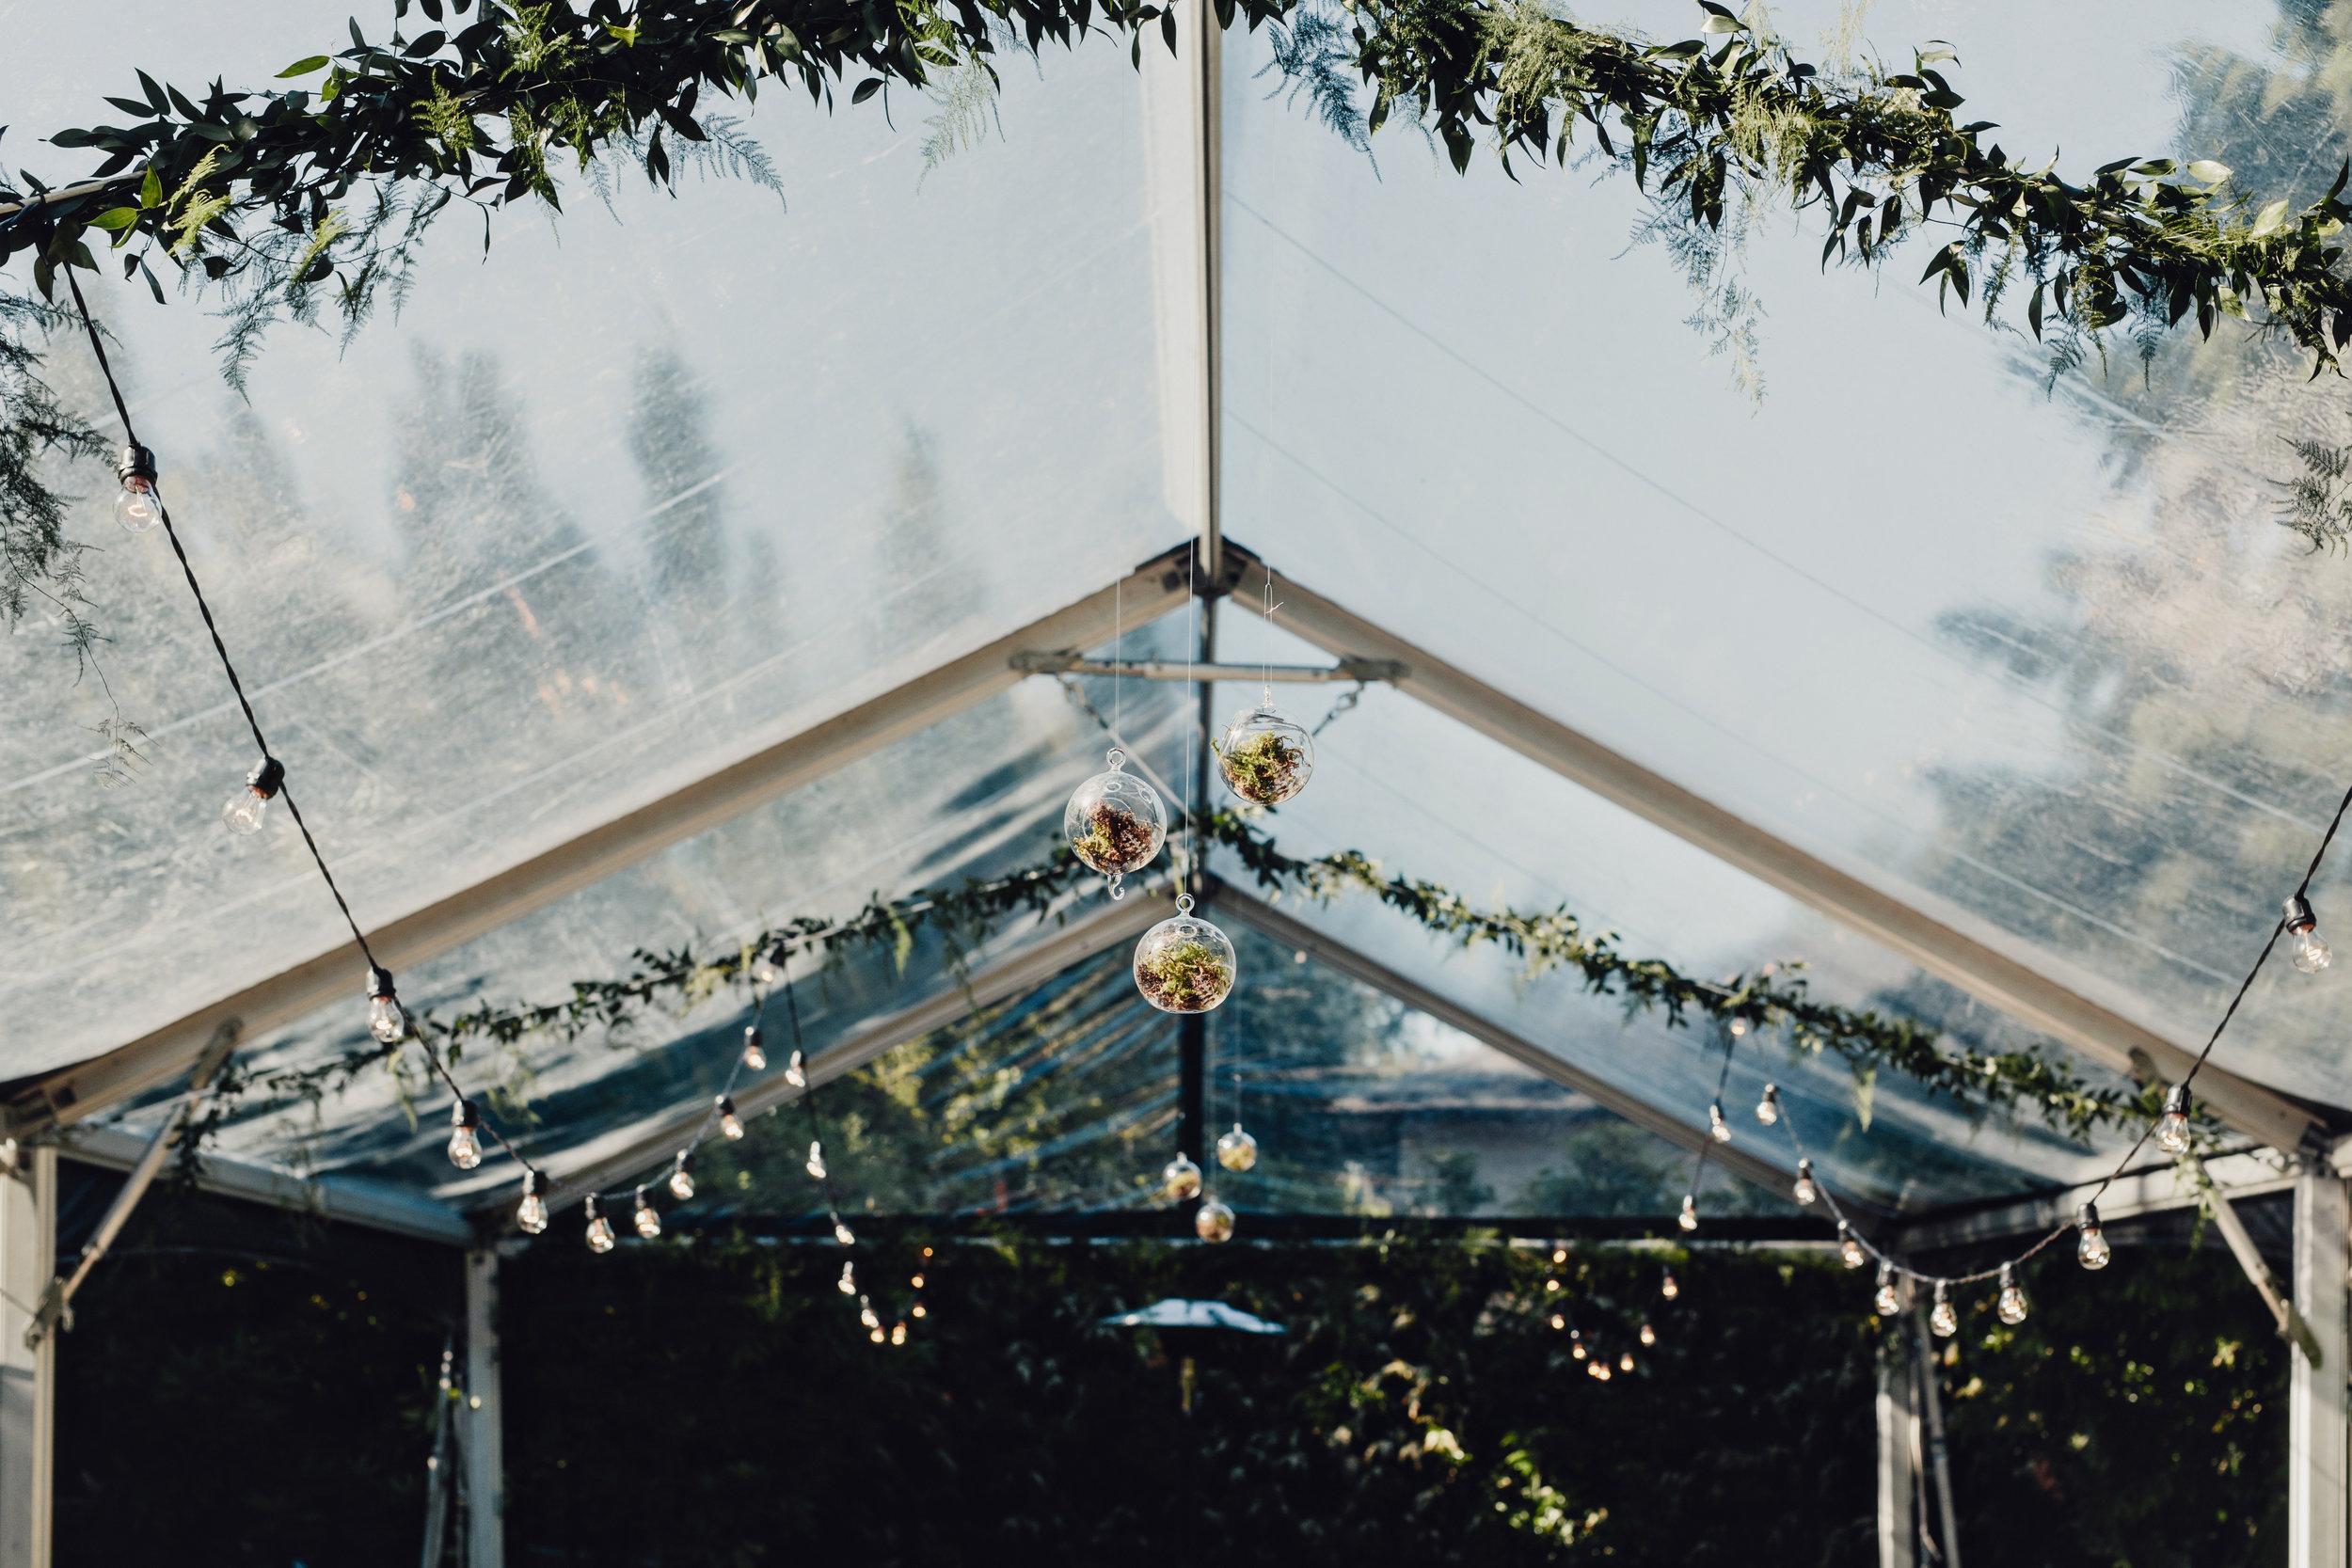 VictoriaBC-FrenchKiss-Events-Wedding-Photos-14.jpg